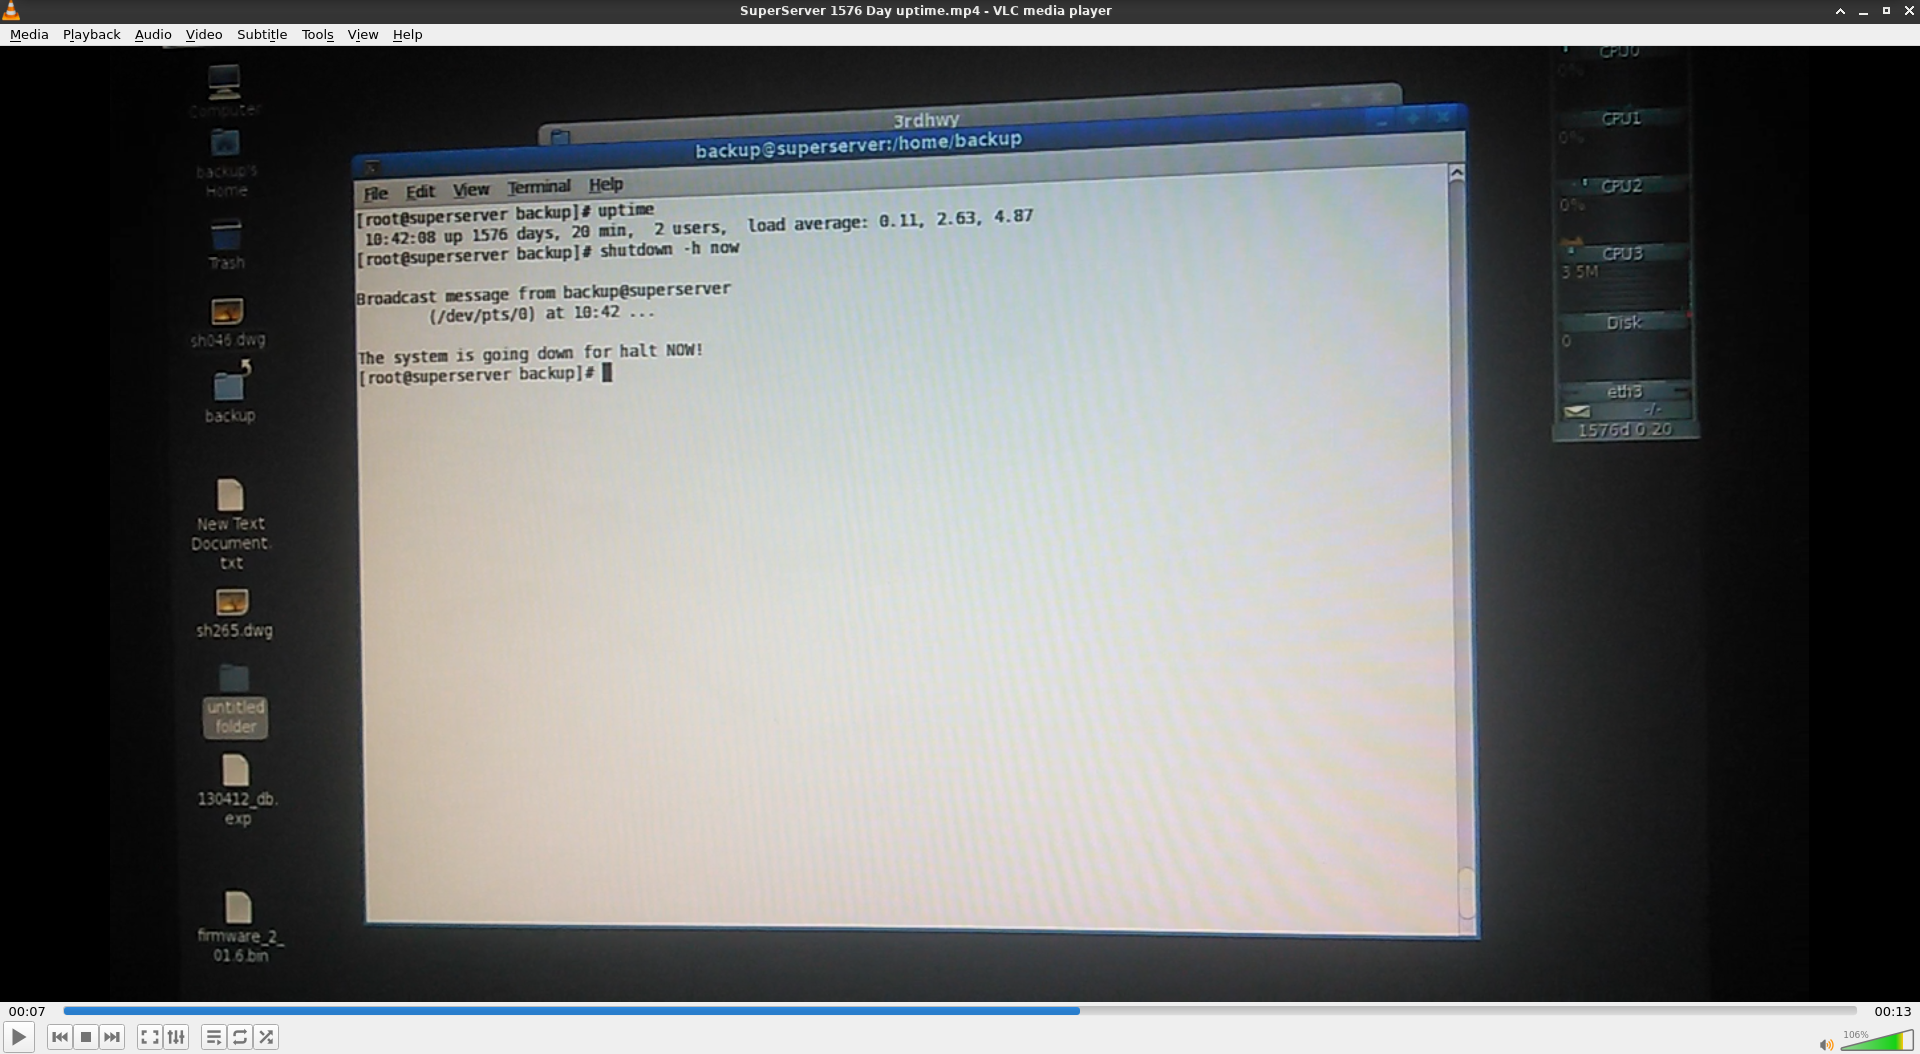 Screenshot_2020-10-17_18-54-48.png